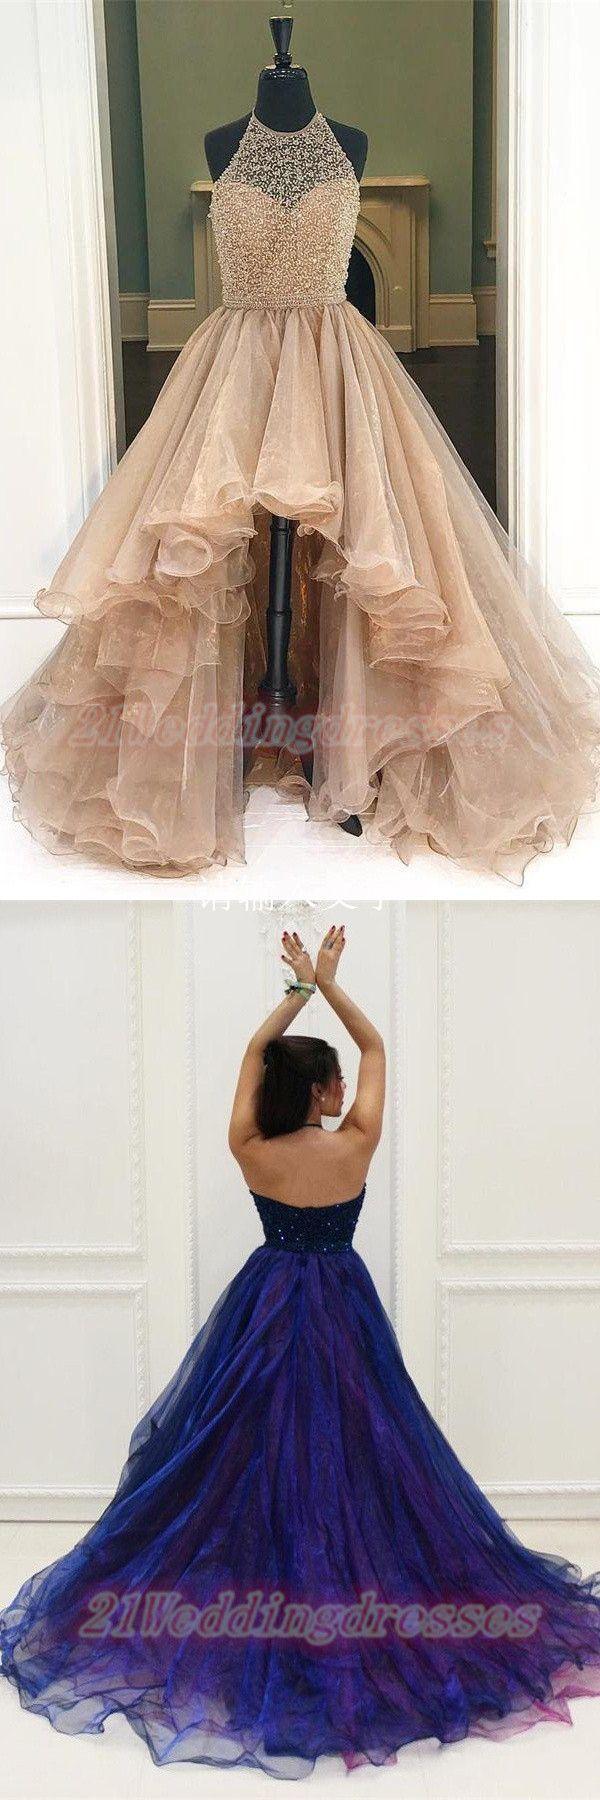 Sparkly gorgeous halter beaded long prom dresses for teensmodest